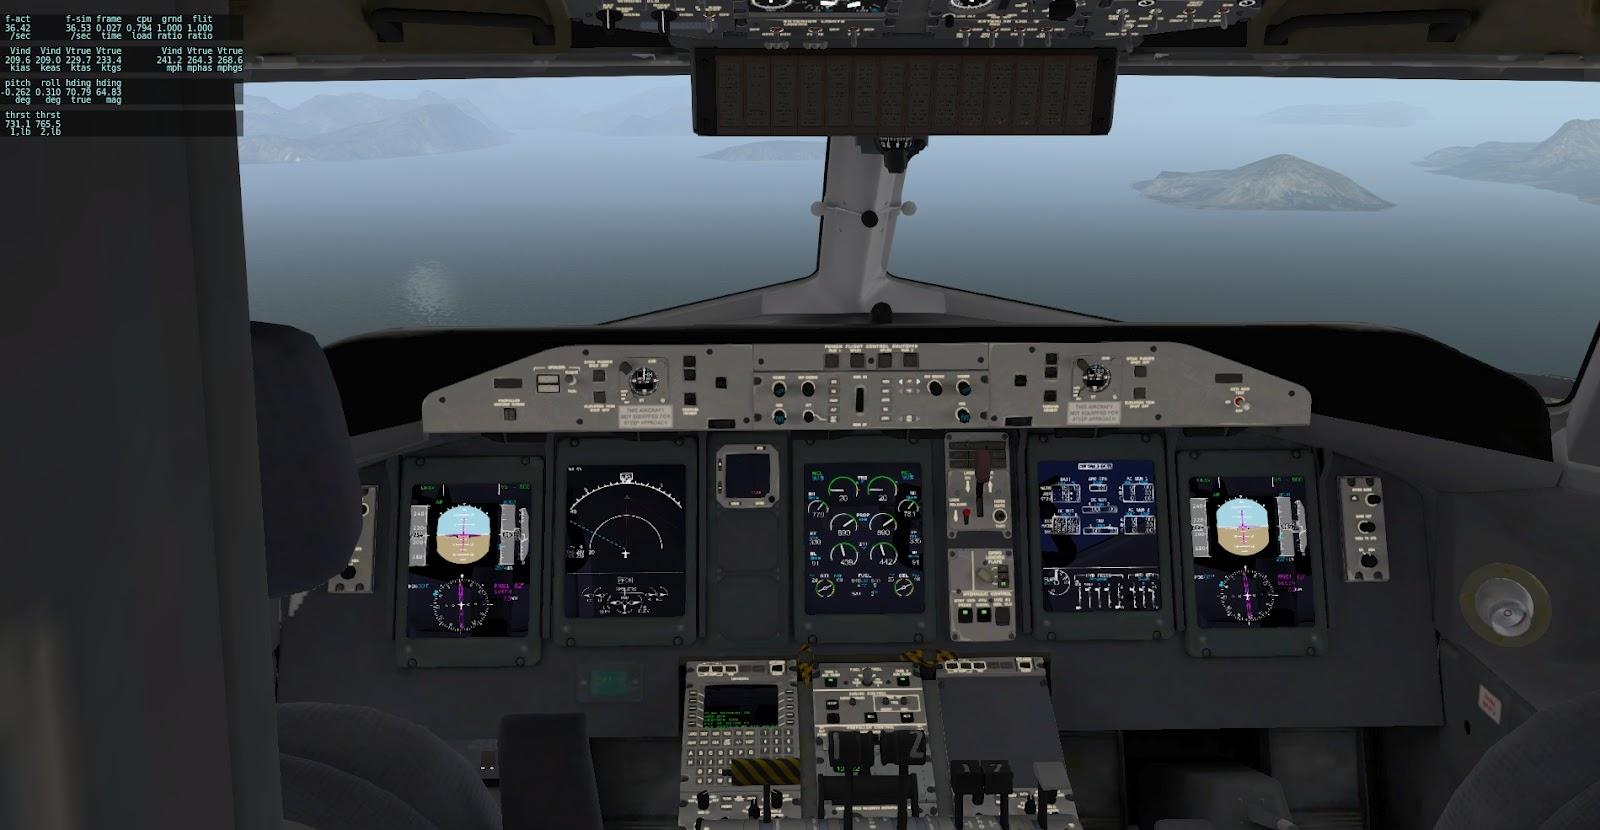 X-Plane, OMSI & EM4 skins: FlyJsim Dash 8 Q400